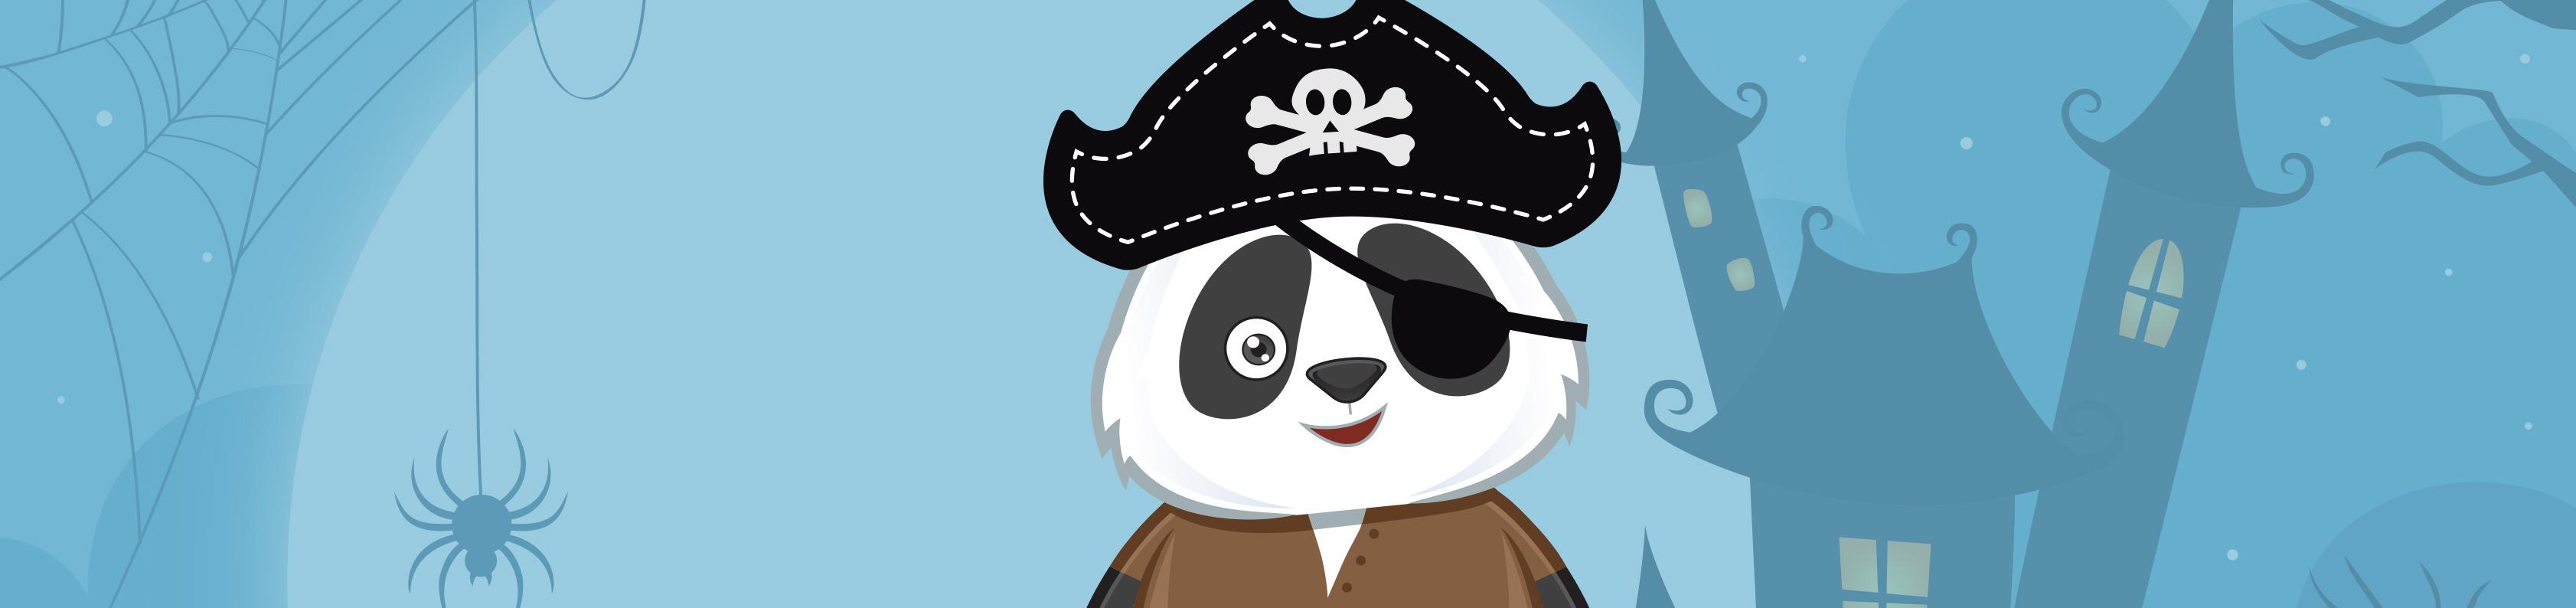 slide-penny-panda-costumes-v1